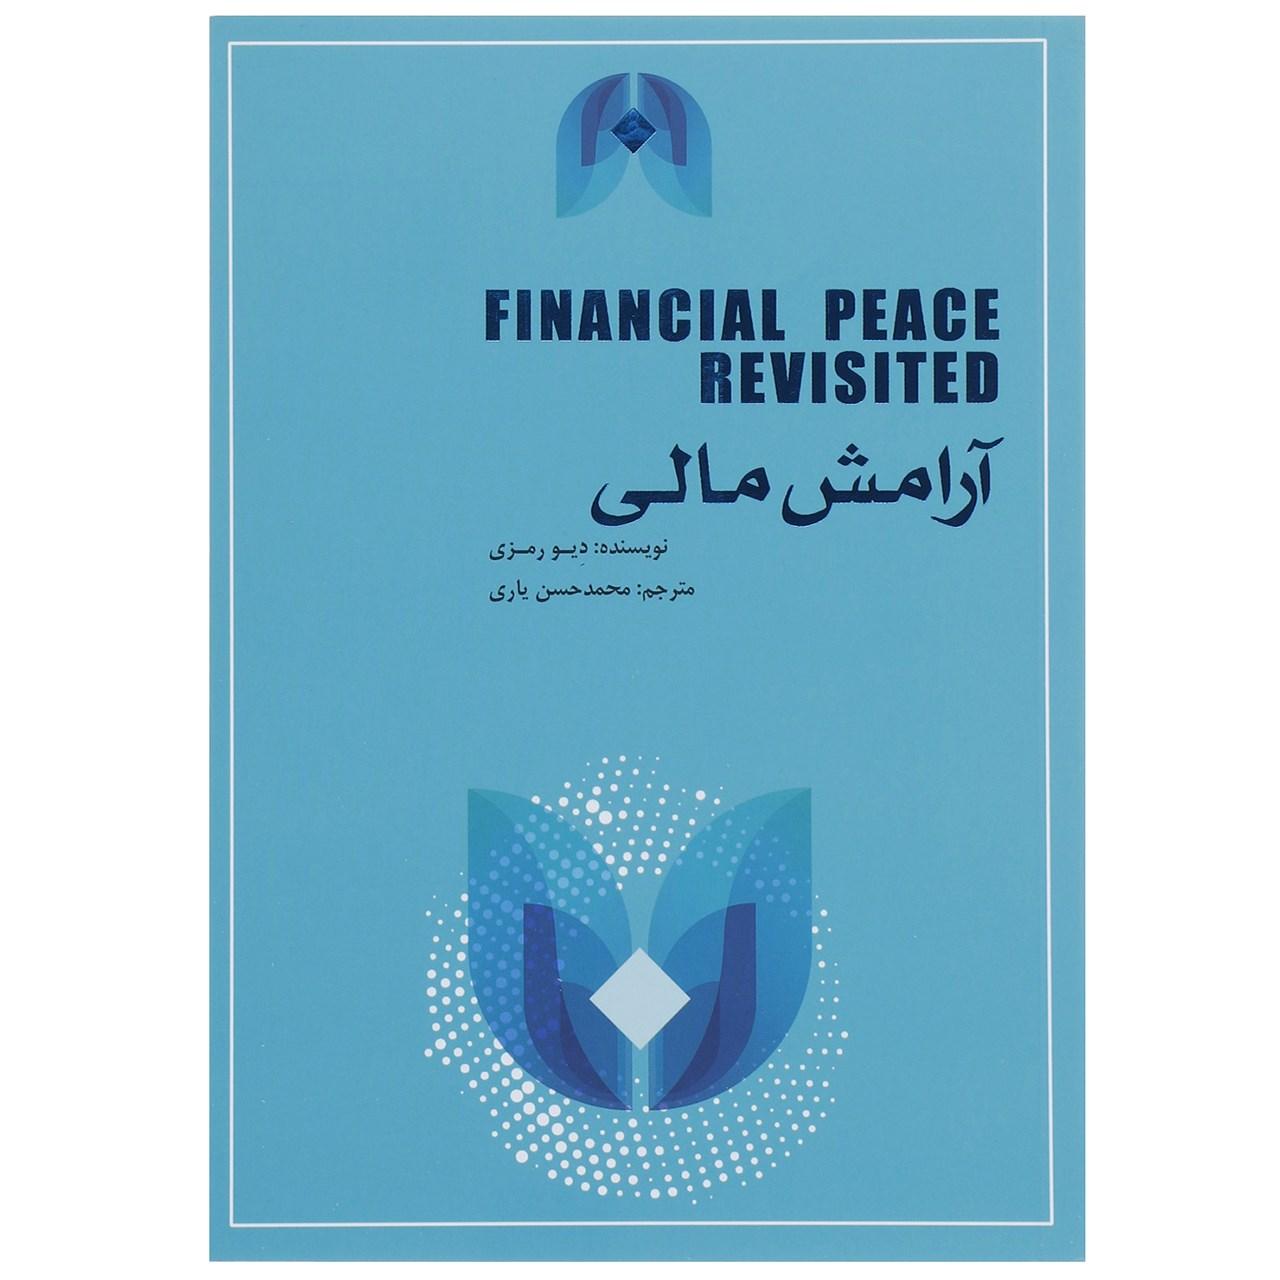 کتاب آرامش مالی اثر دیو رمزی